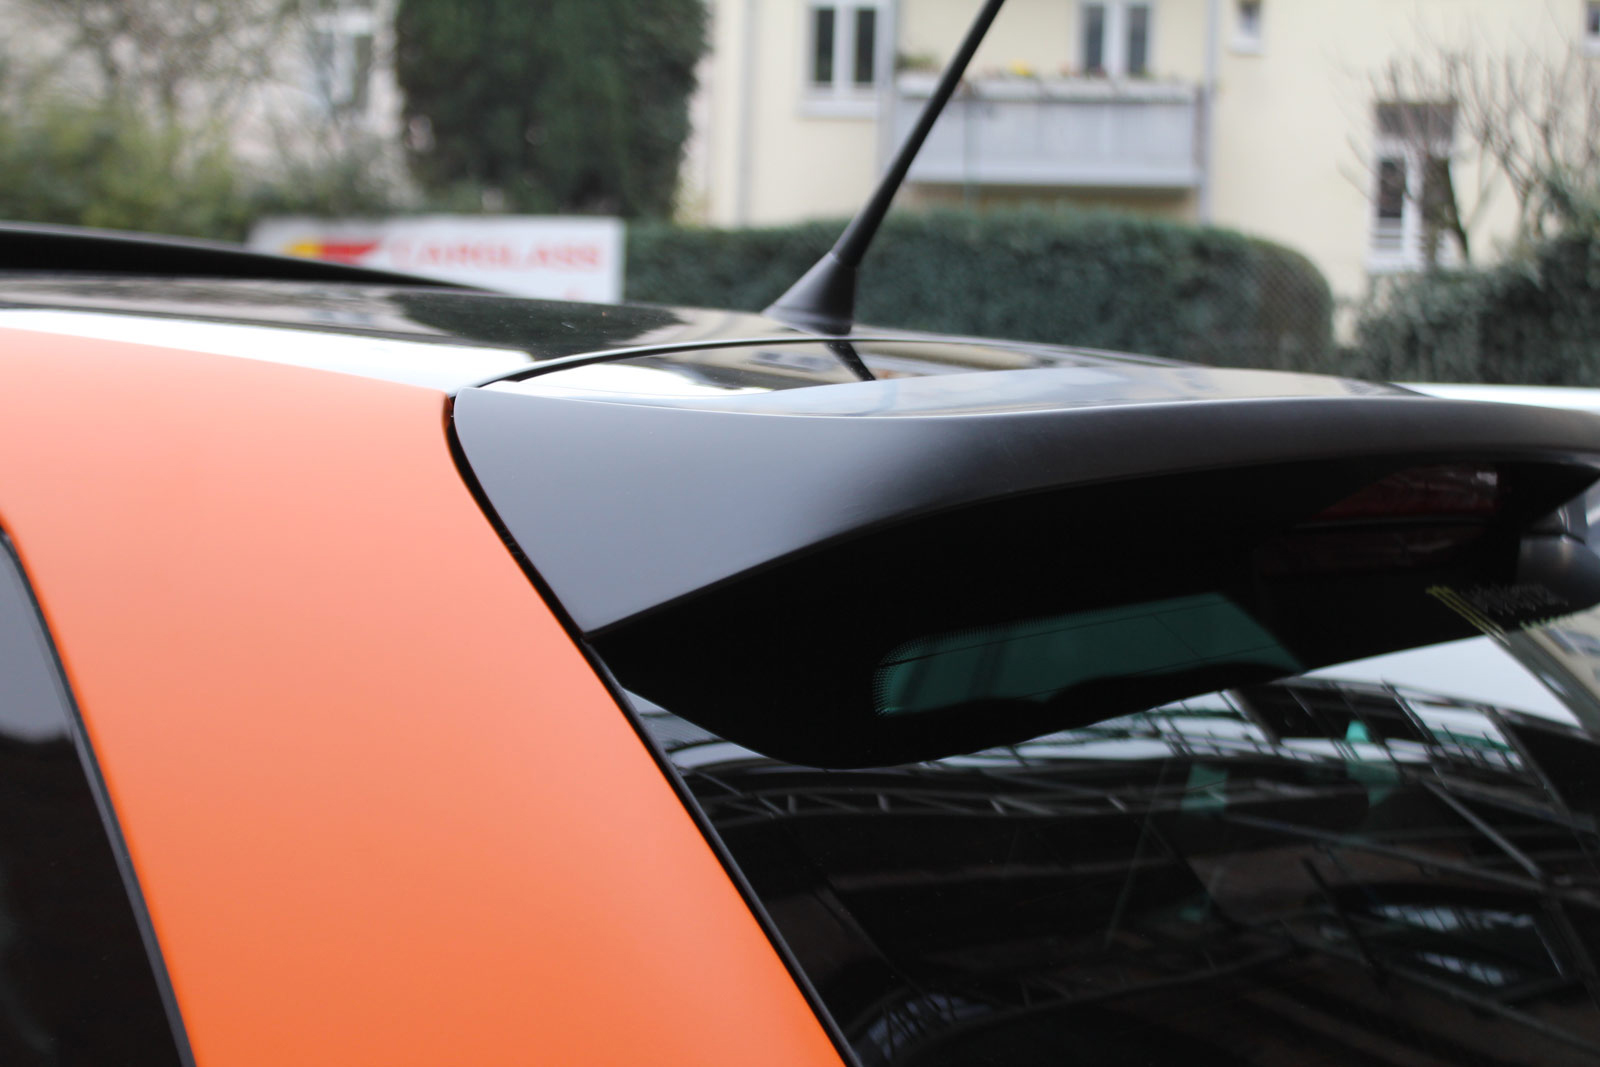 VW_Polo_GTI_Folierung_Orange_Matt_17